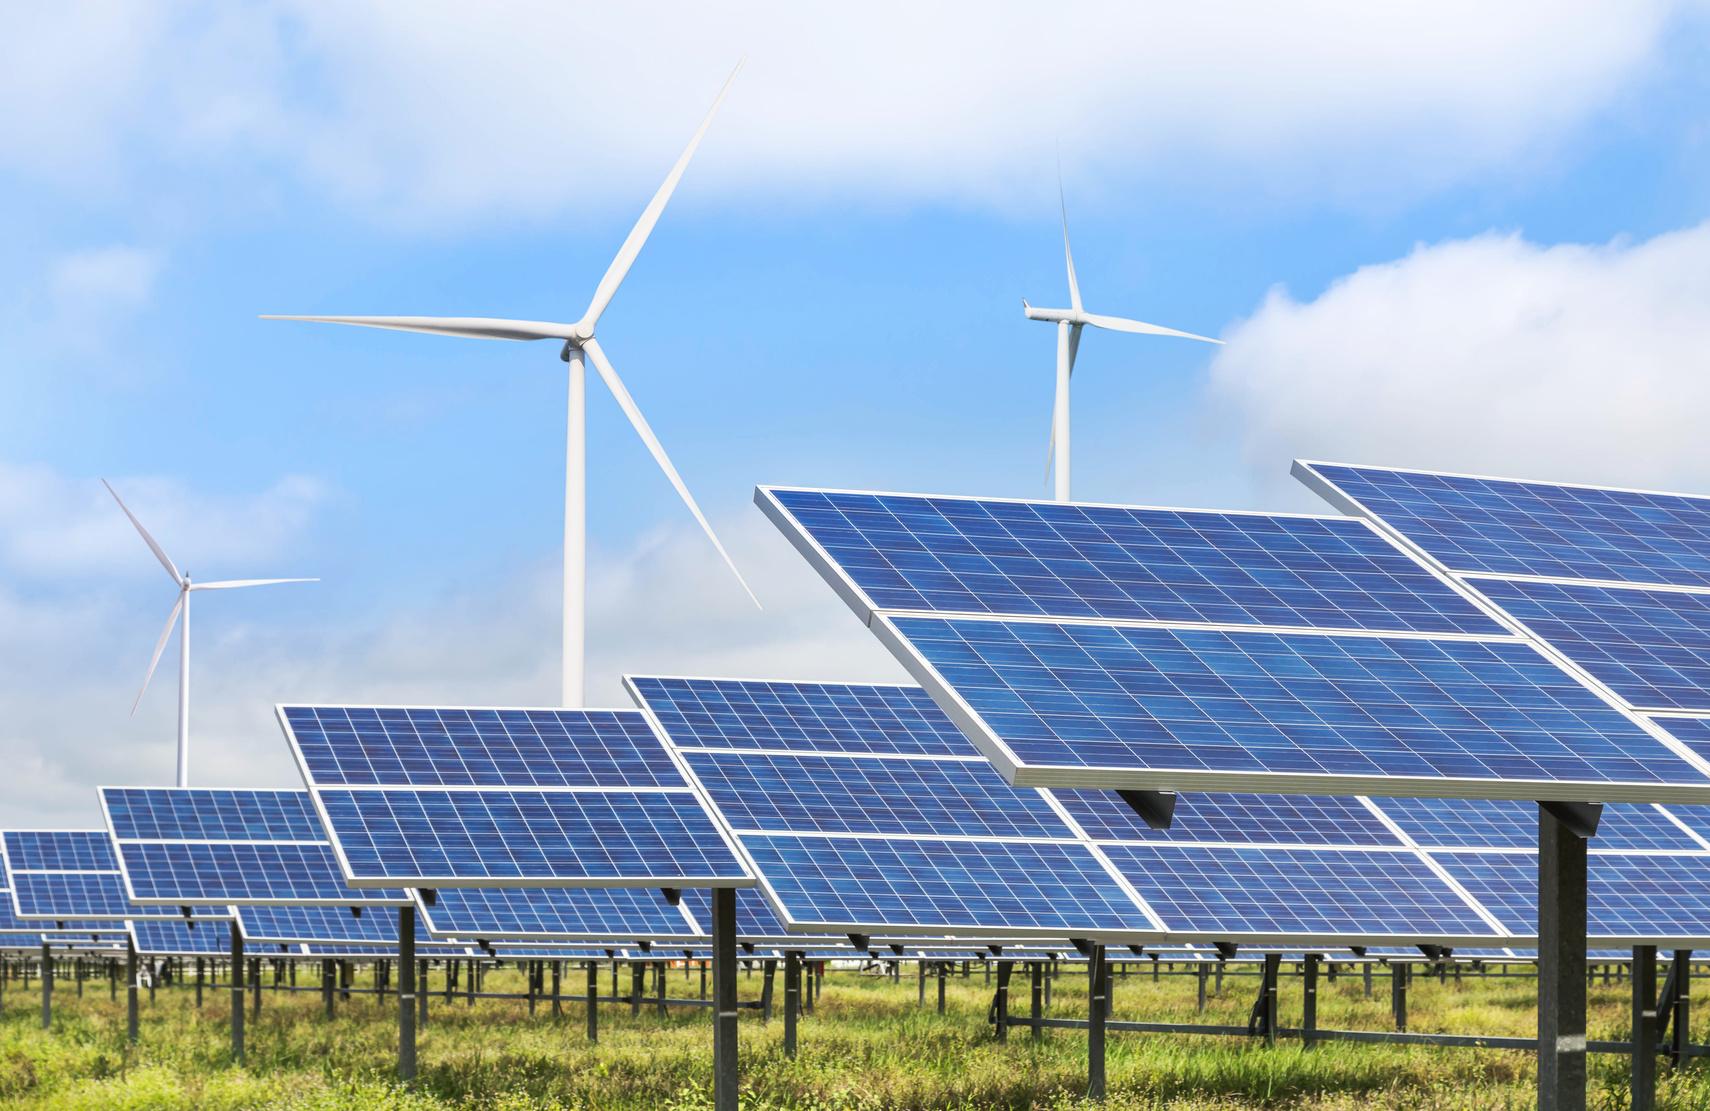 Solarpanele vor Windrädern